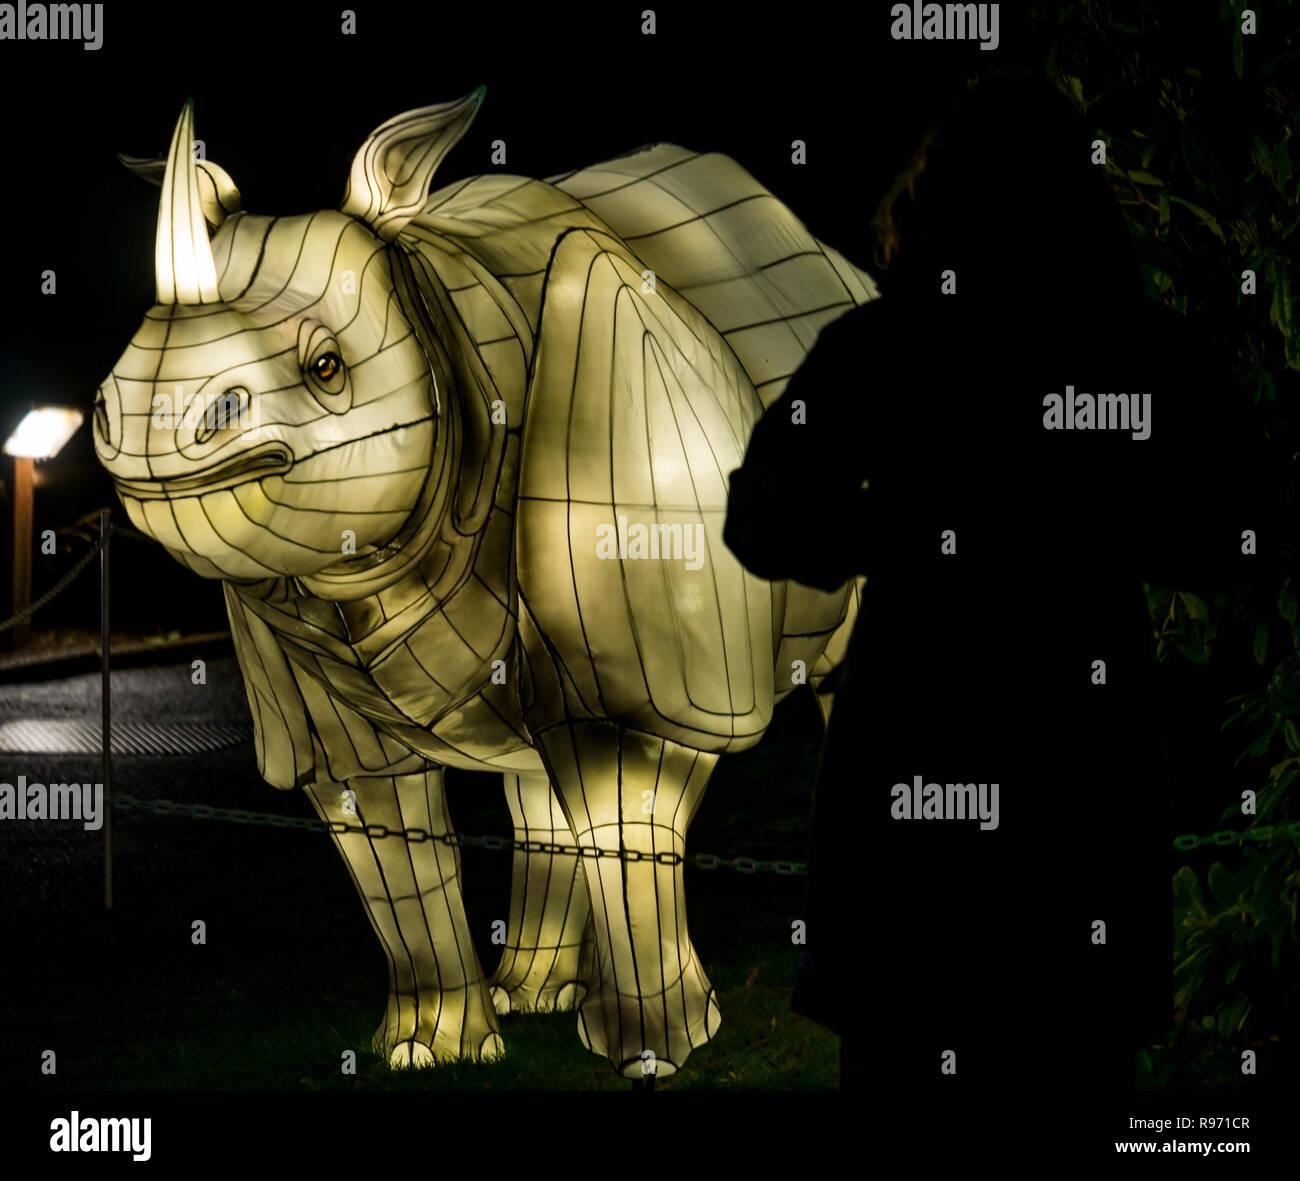 Rhino Edinburgh Zoo Stock Photos & Rhino Edinburgh Zoo